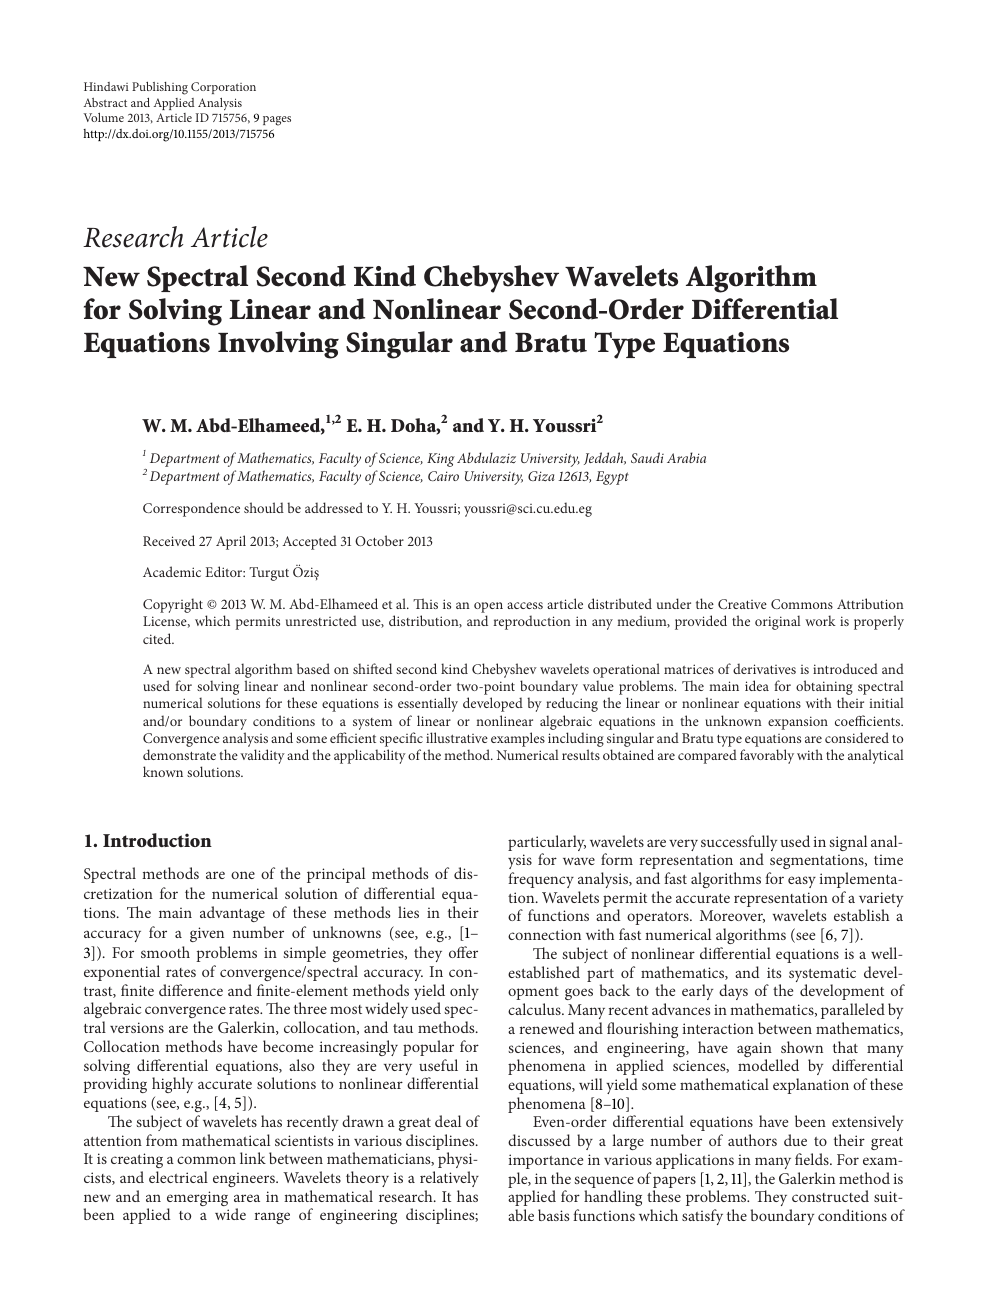 New Spectral Second Kind Chebyshev Wavelets Algorithm For Solving